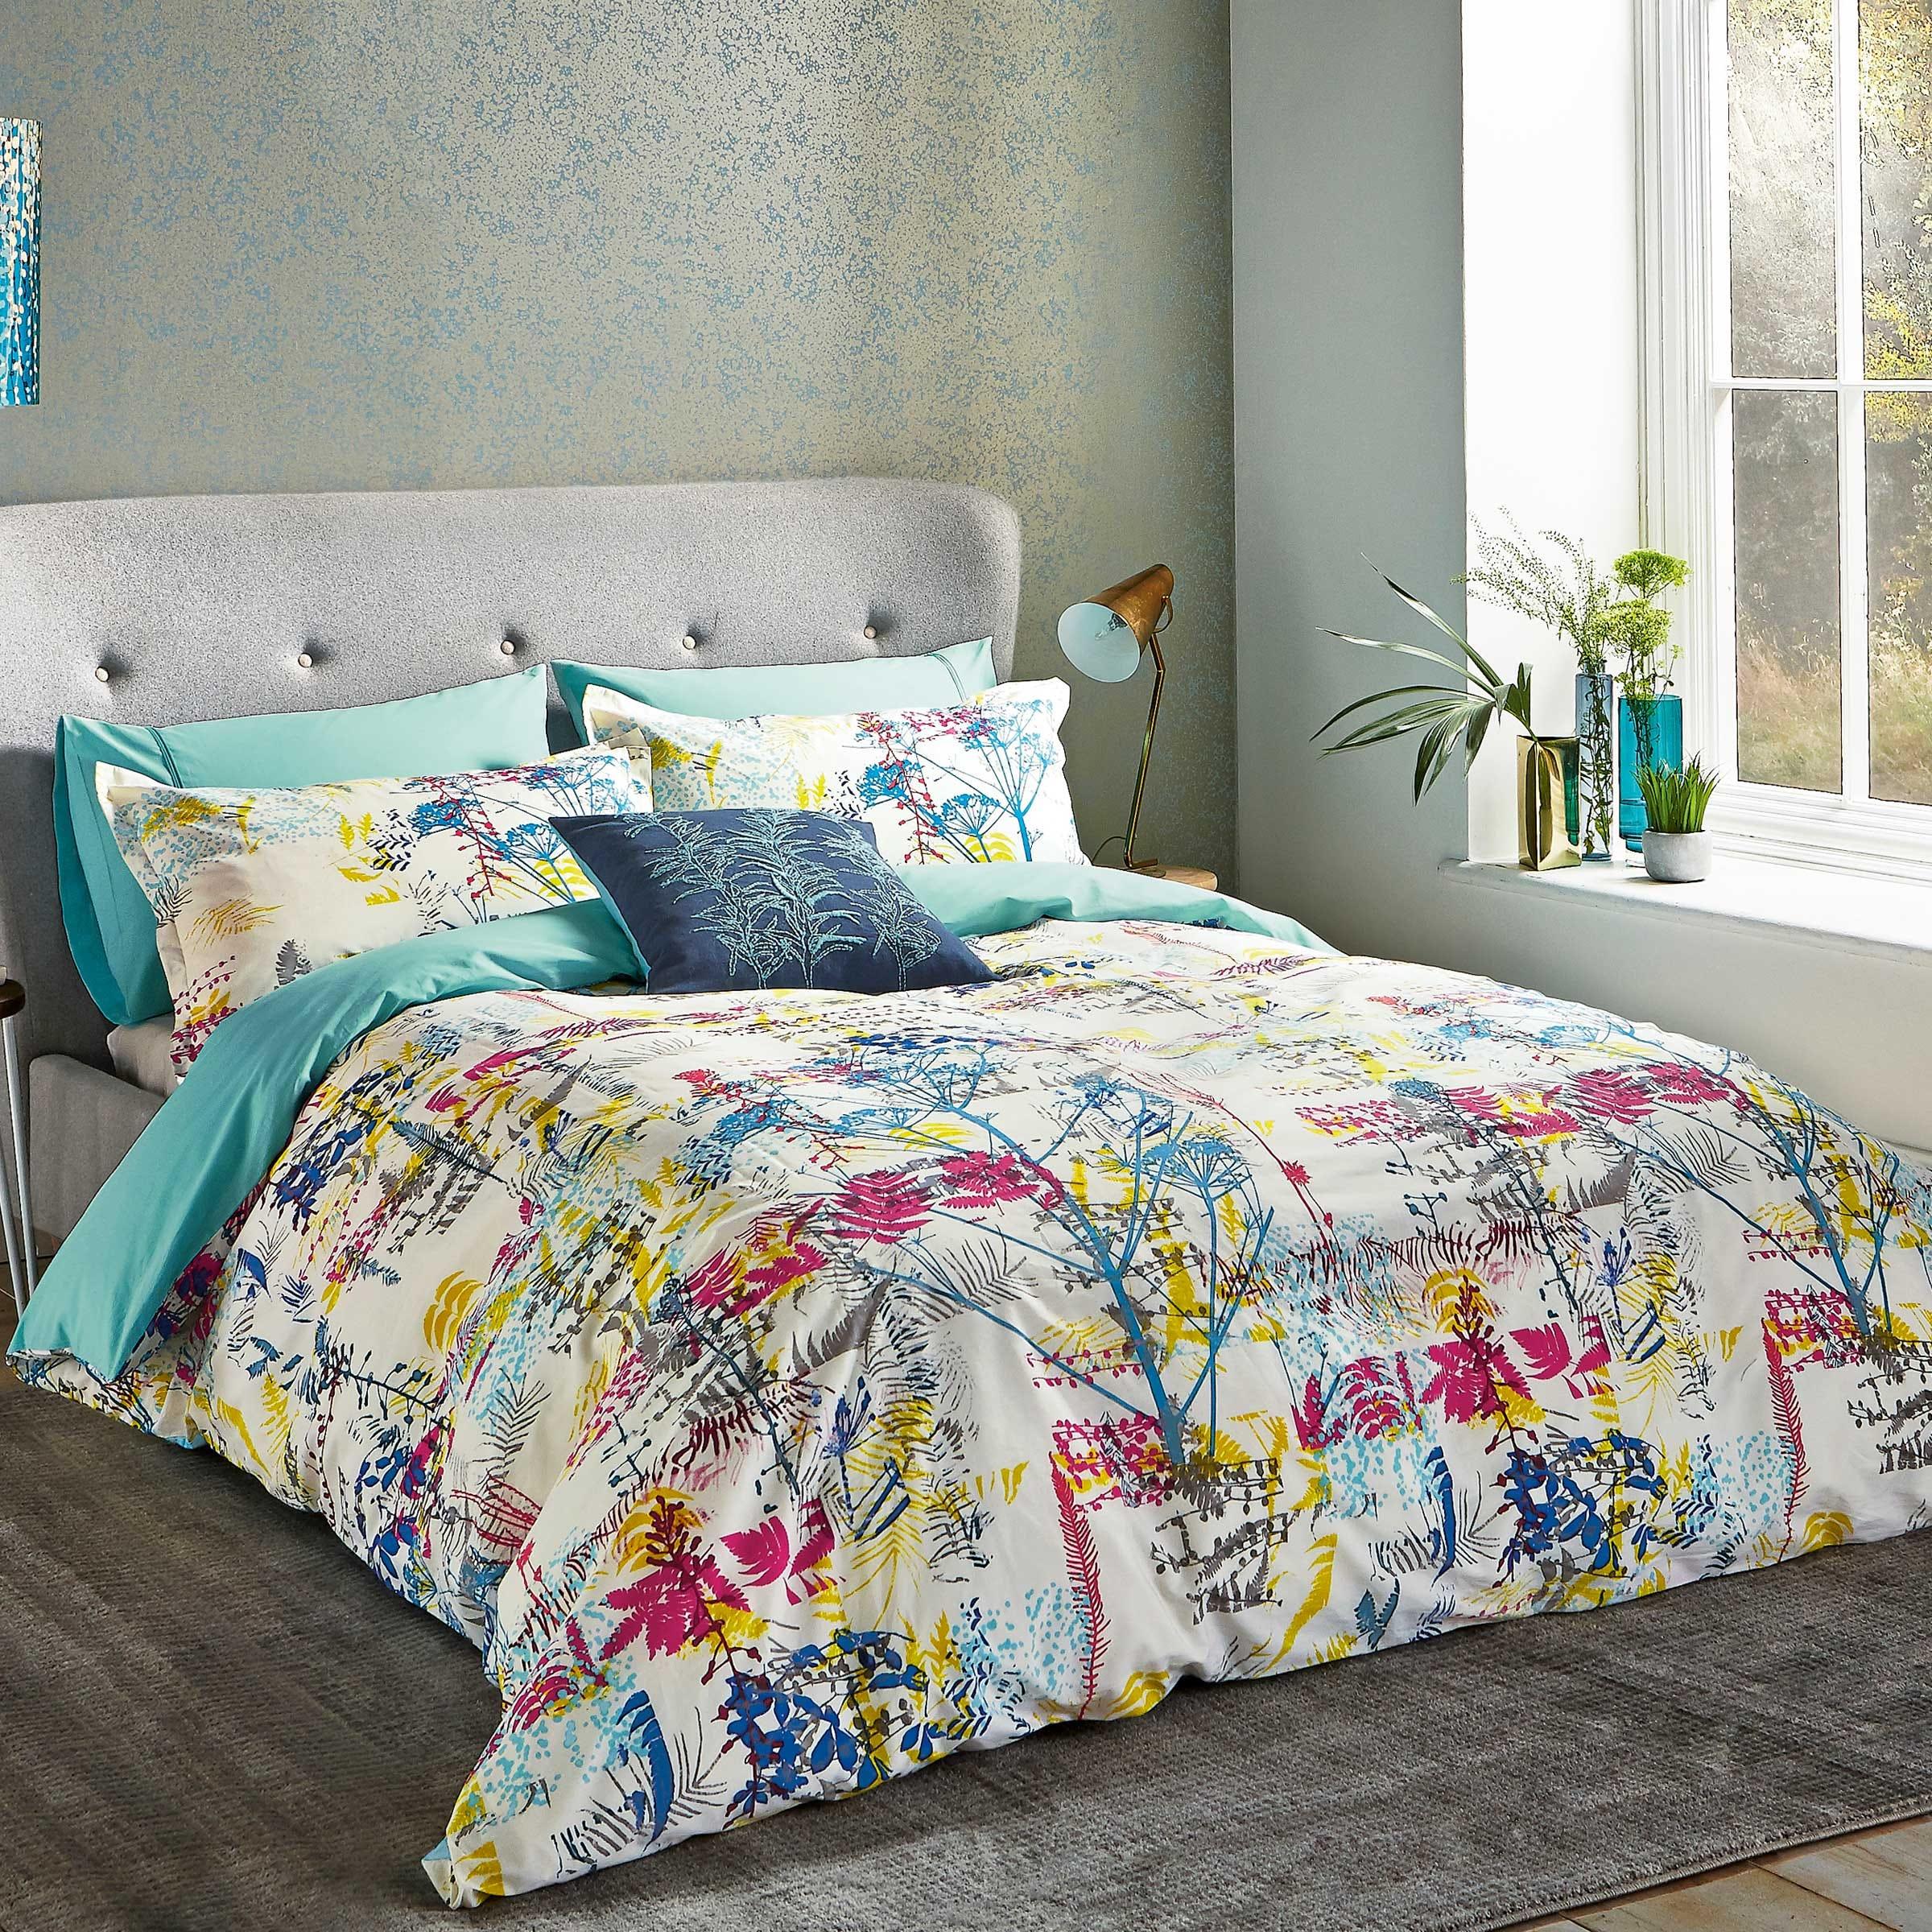 Clarissa Hulse Bedding Backing Cloth Kingsize Duvet Cover Multi Coloured